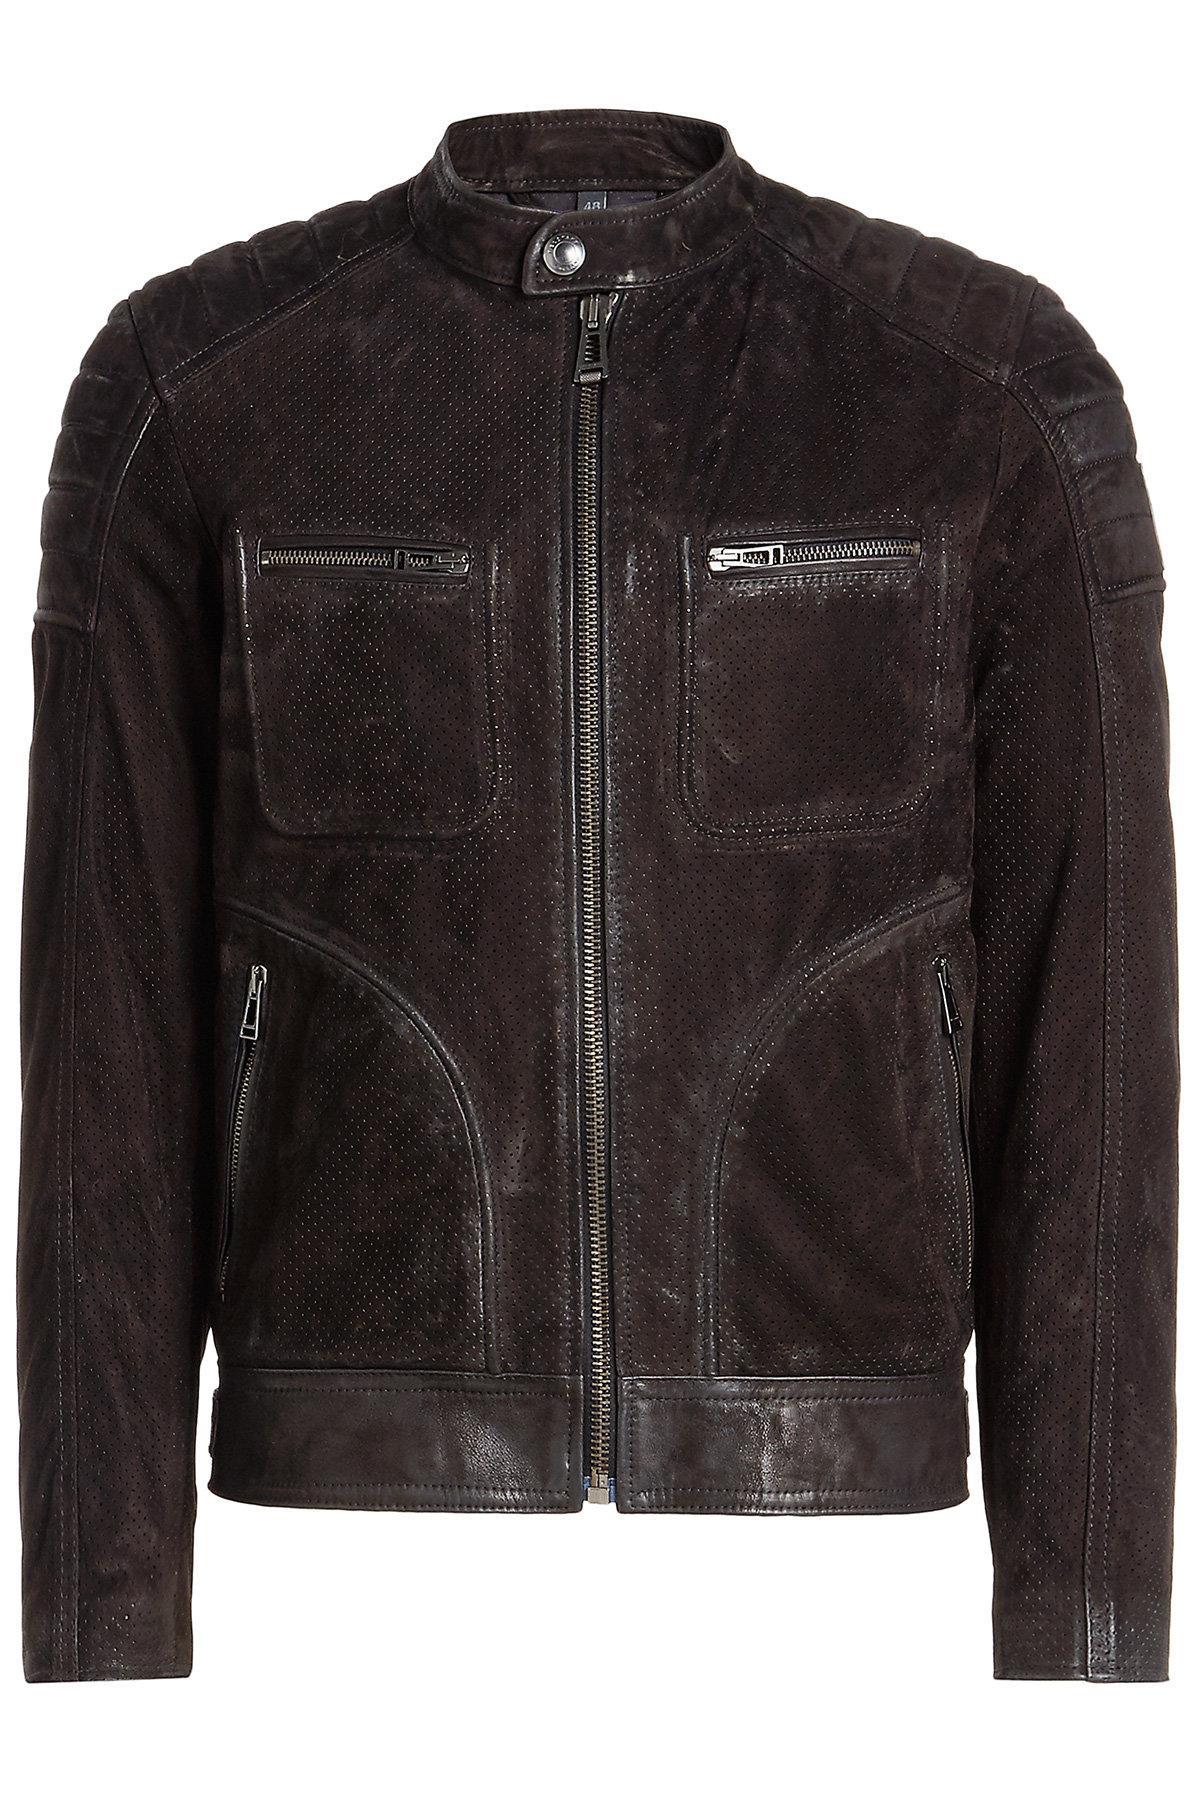 lyst belstaff weybridge suede jacket in black for men. Black Bedroom Furniture Sets. Home Design Ideas